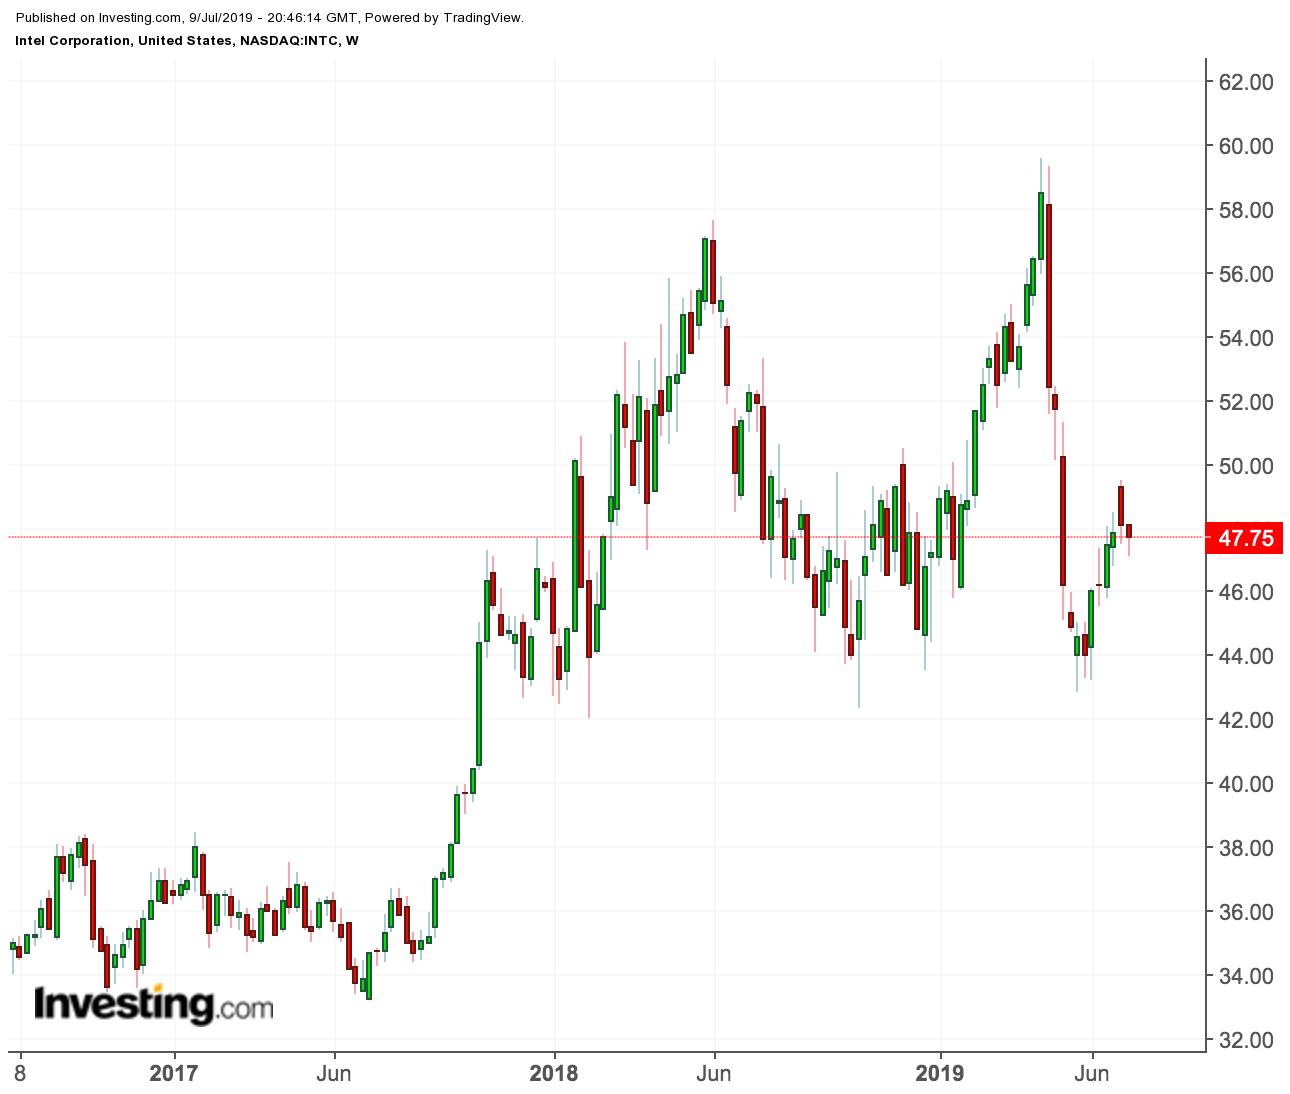 Intel price chart